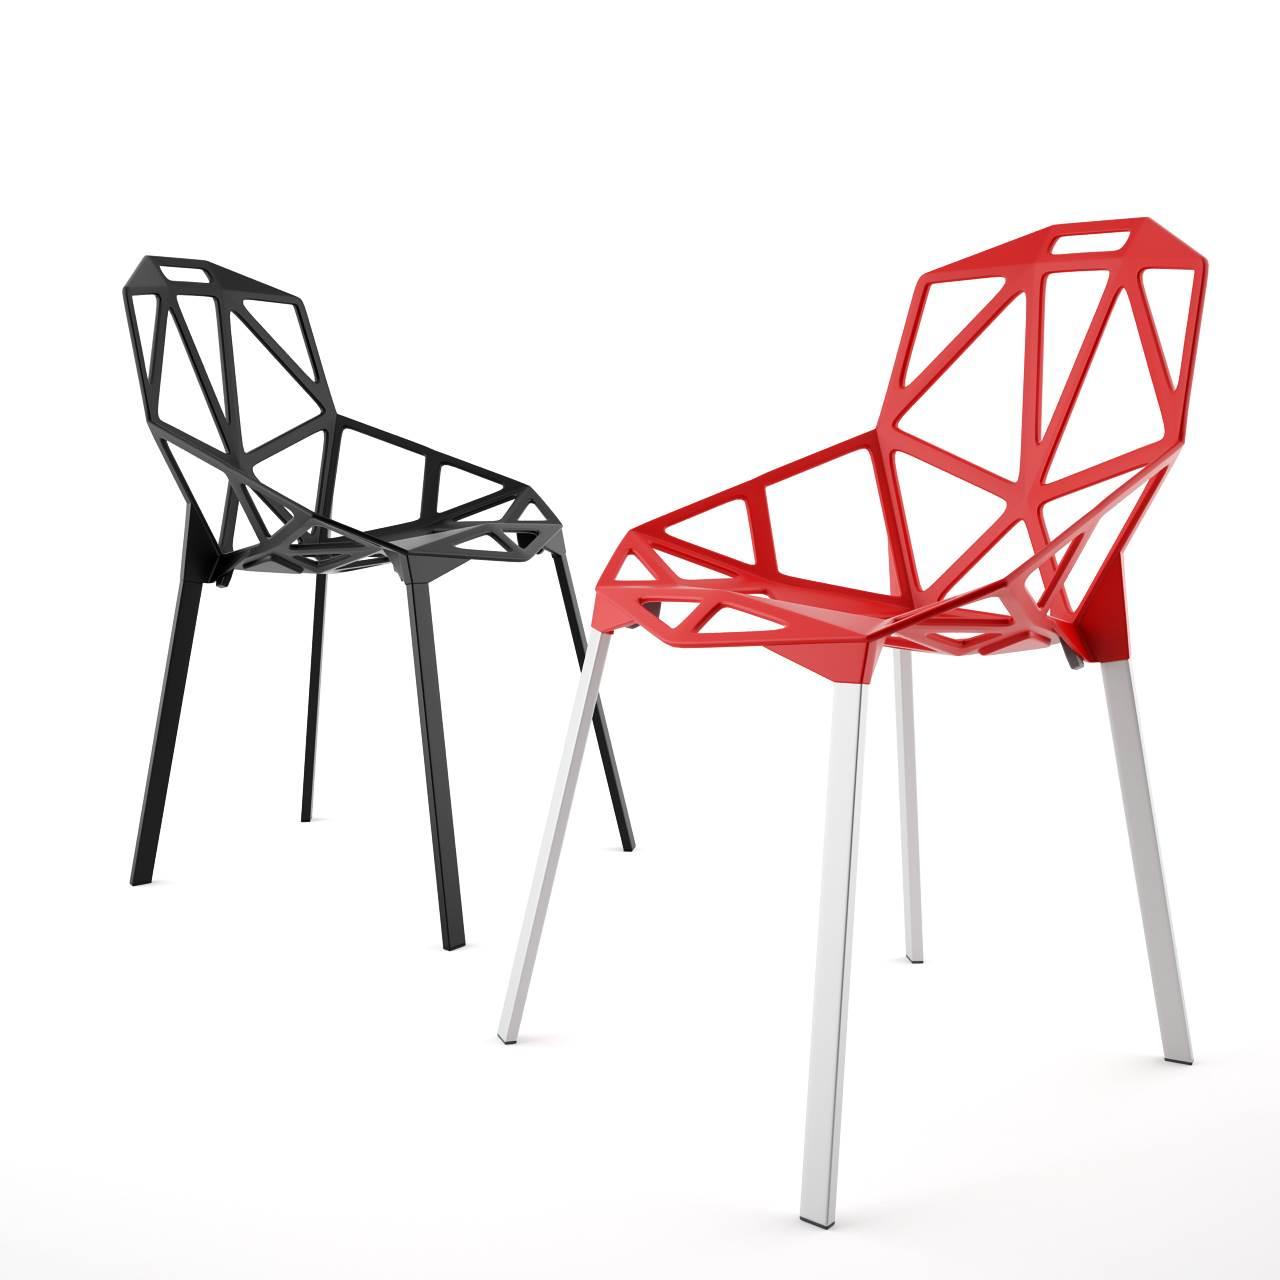 Chair One Magis Sistema Arreda Shop Arredamento : sedie chair magis from www.sistemaarreda.com size 1280 x 1280 jpeg 77kB